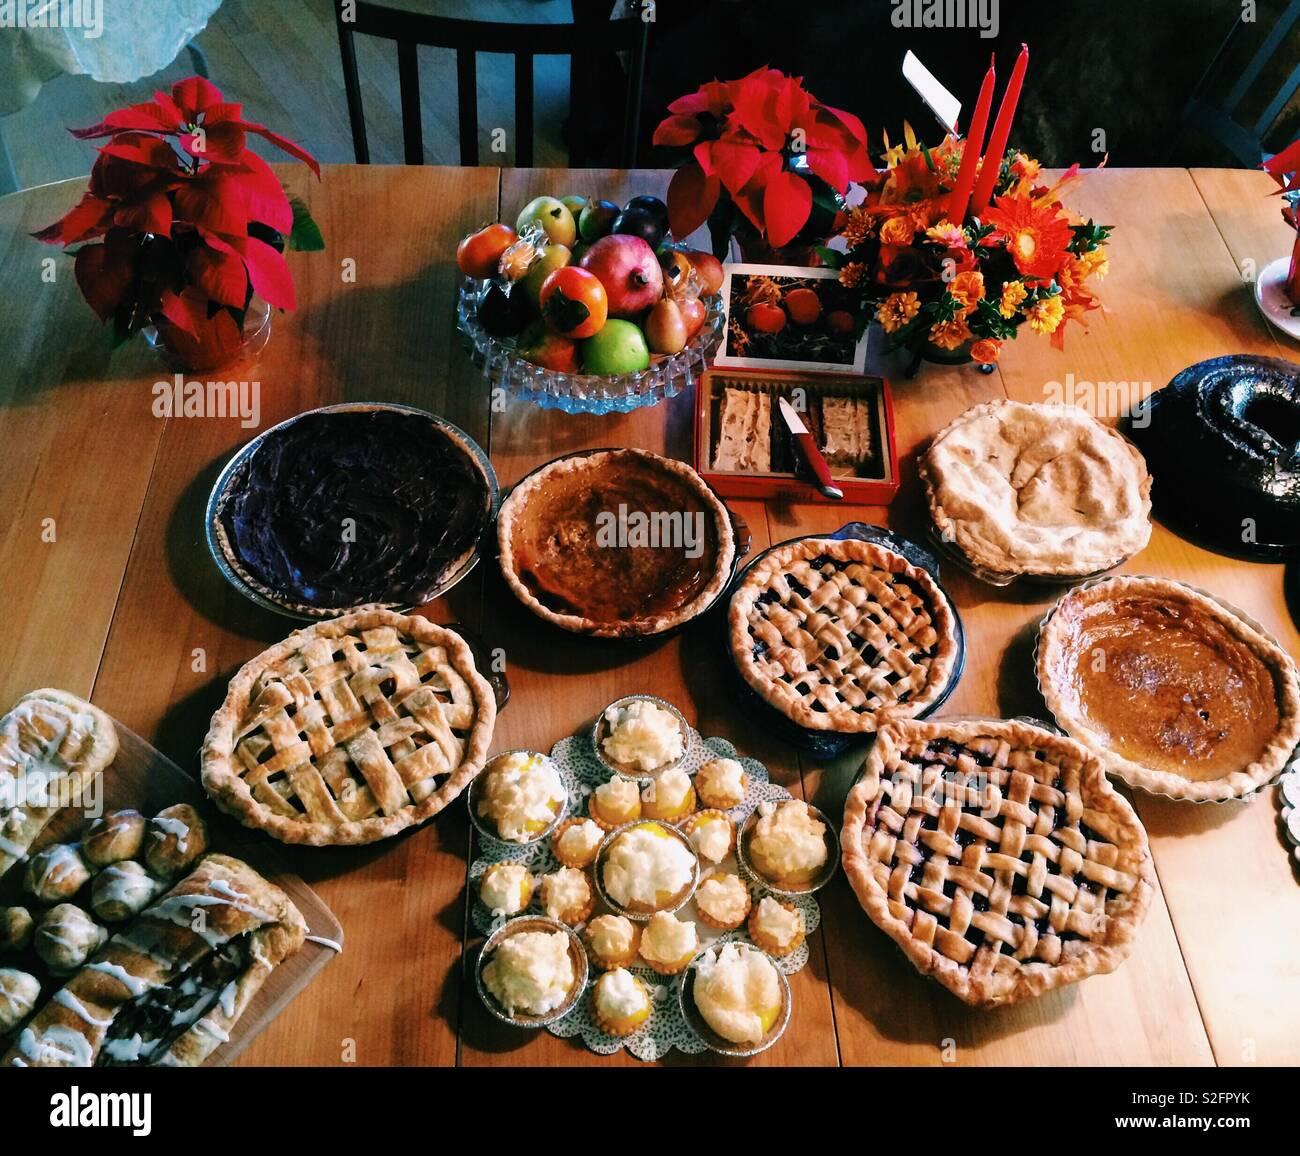 Thanksgiving Dessert Table Stock Photo Alamy